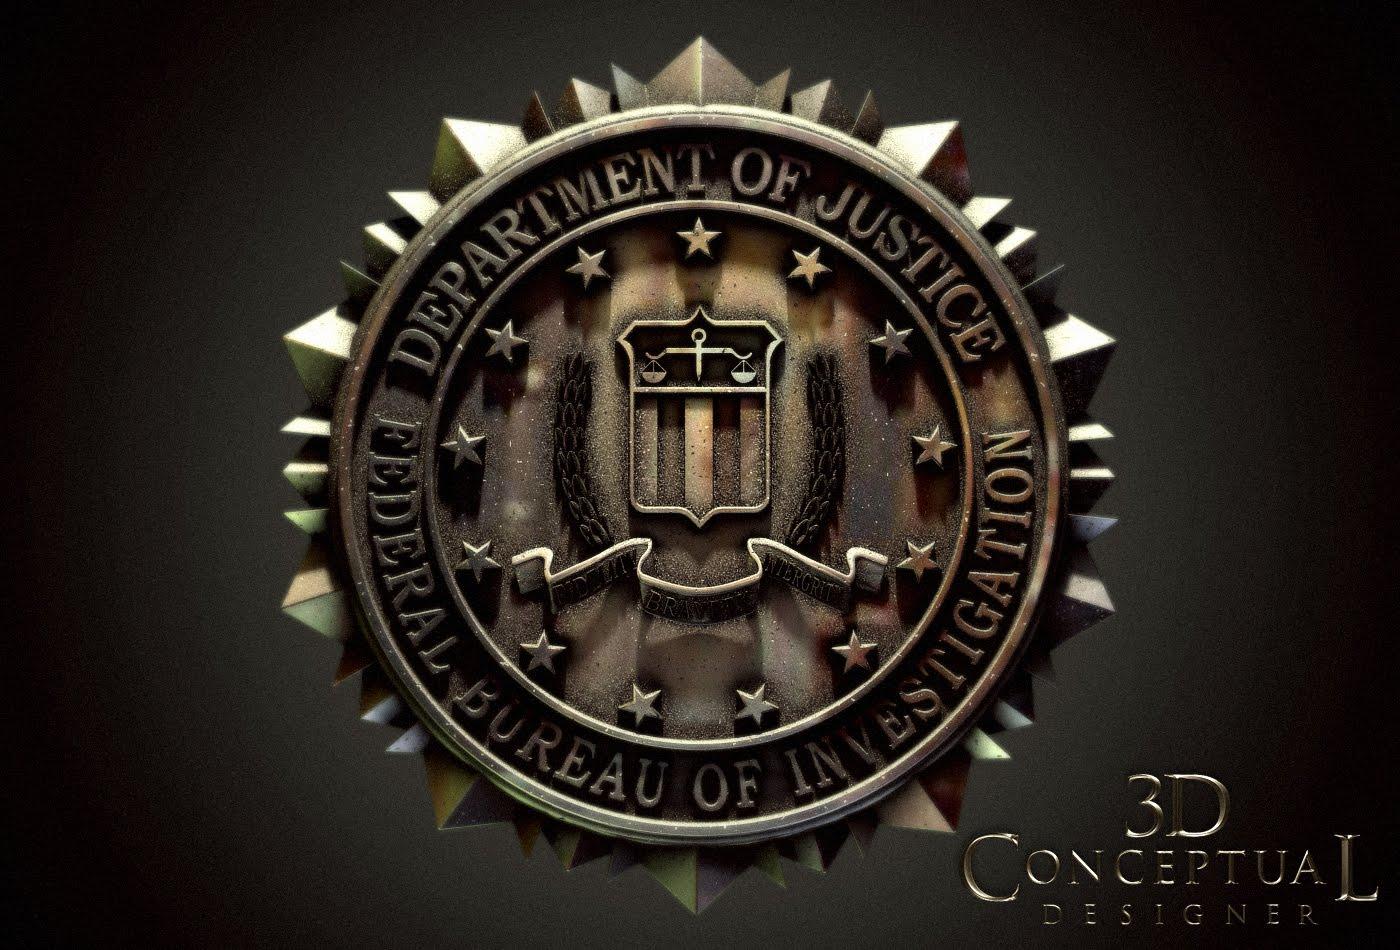 http://1.bp.blogspot.com/-L0WOPylmQoY/TV6mcKIAjPI/AAAAAAAAD6A/i3K0taDfy_4/s1600/Crests_FBI_Badge-01b.jpg